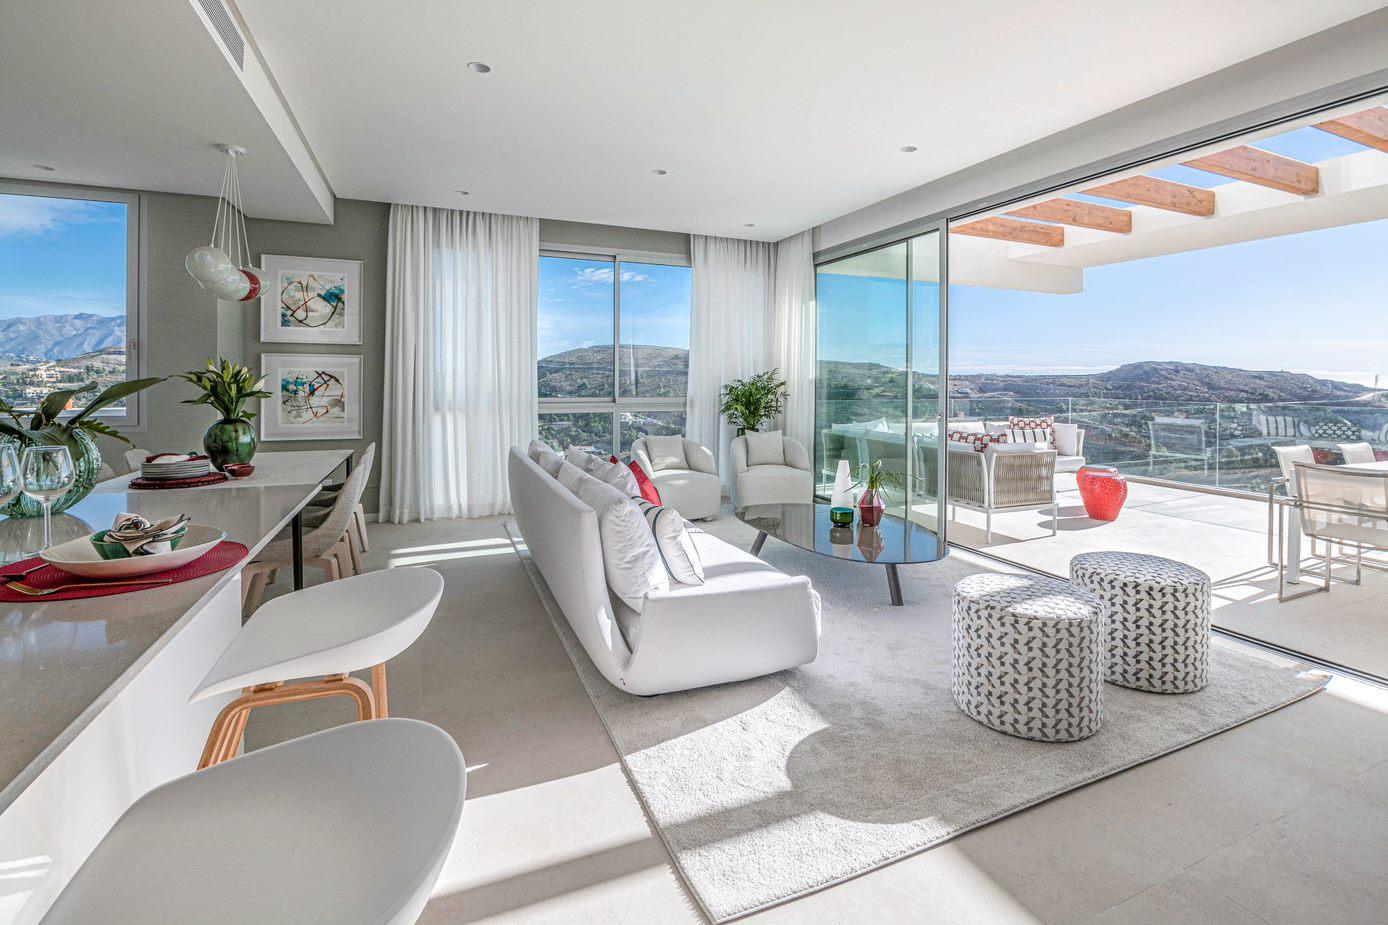 AALTO Exclusive Design -The Best Luxury Interior Design Studio in Spain 2020 - Rhapsody Magazine